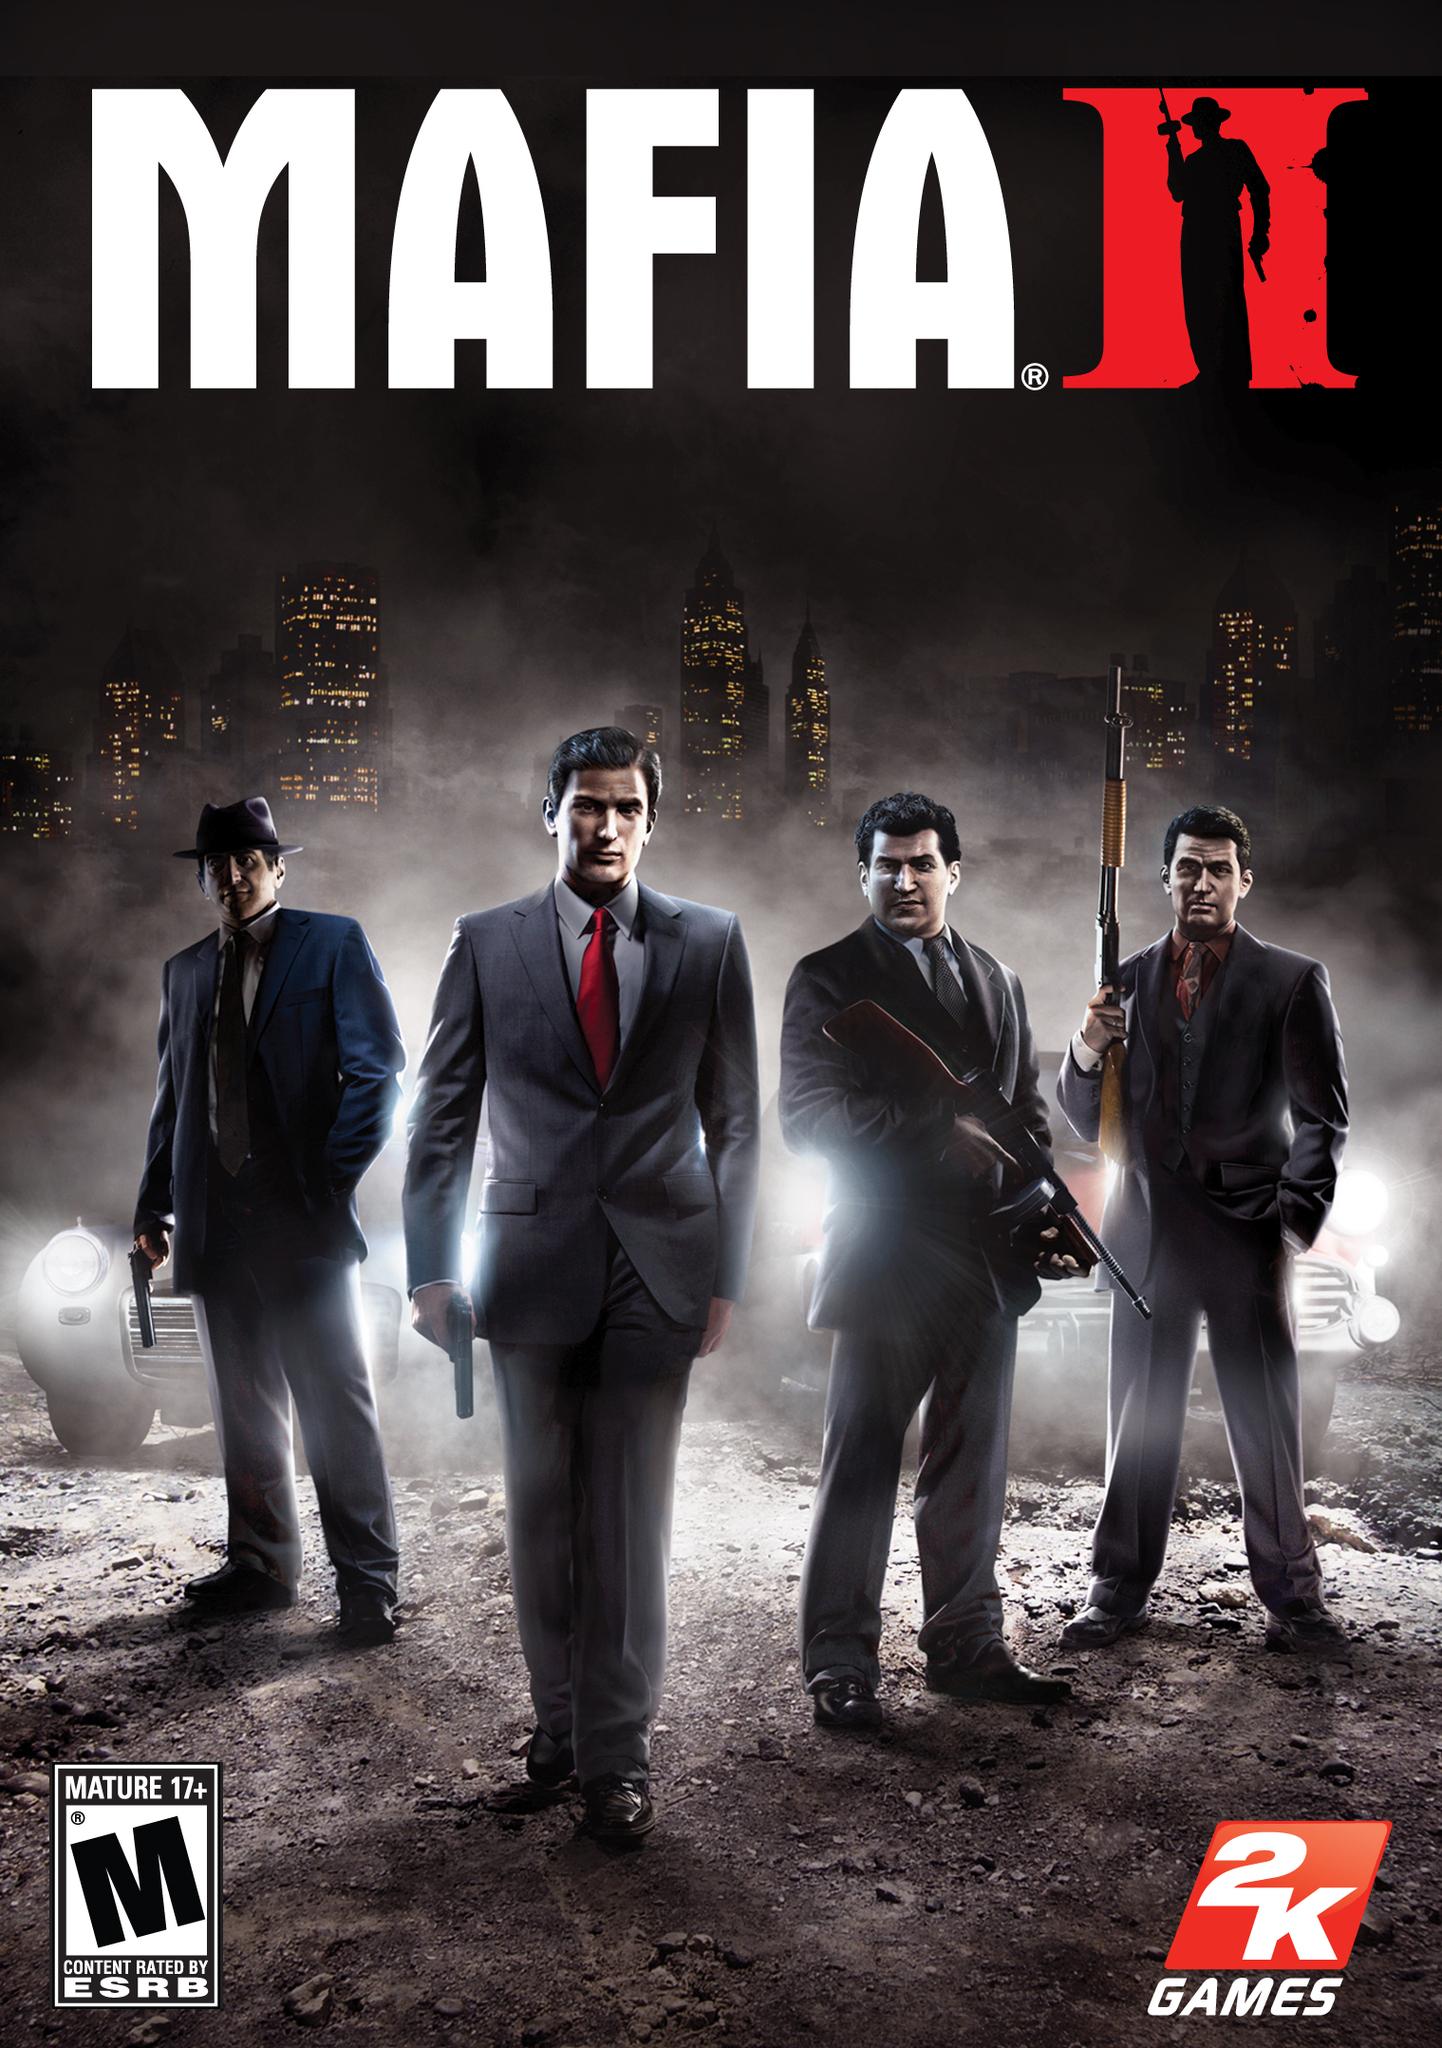 Top games similar to Mafia 2